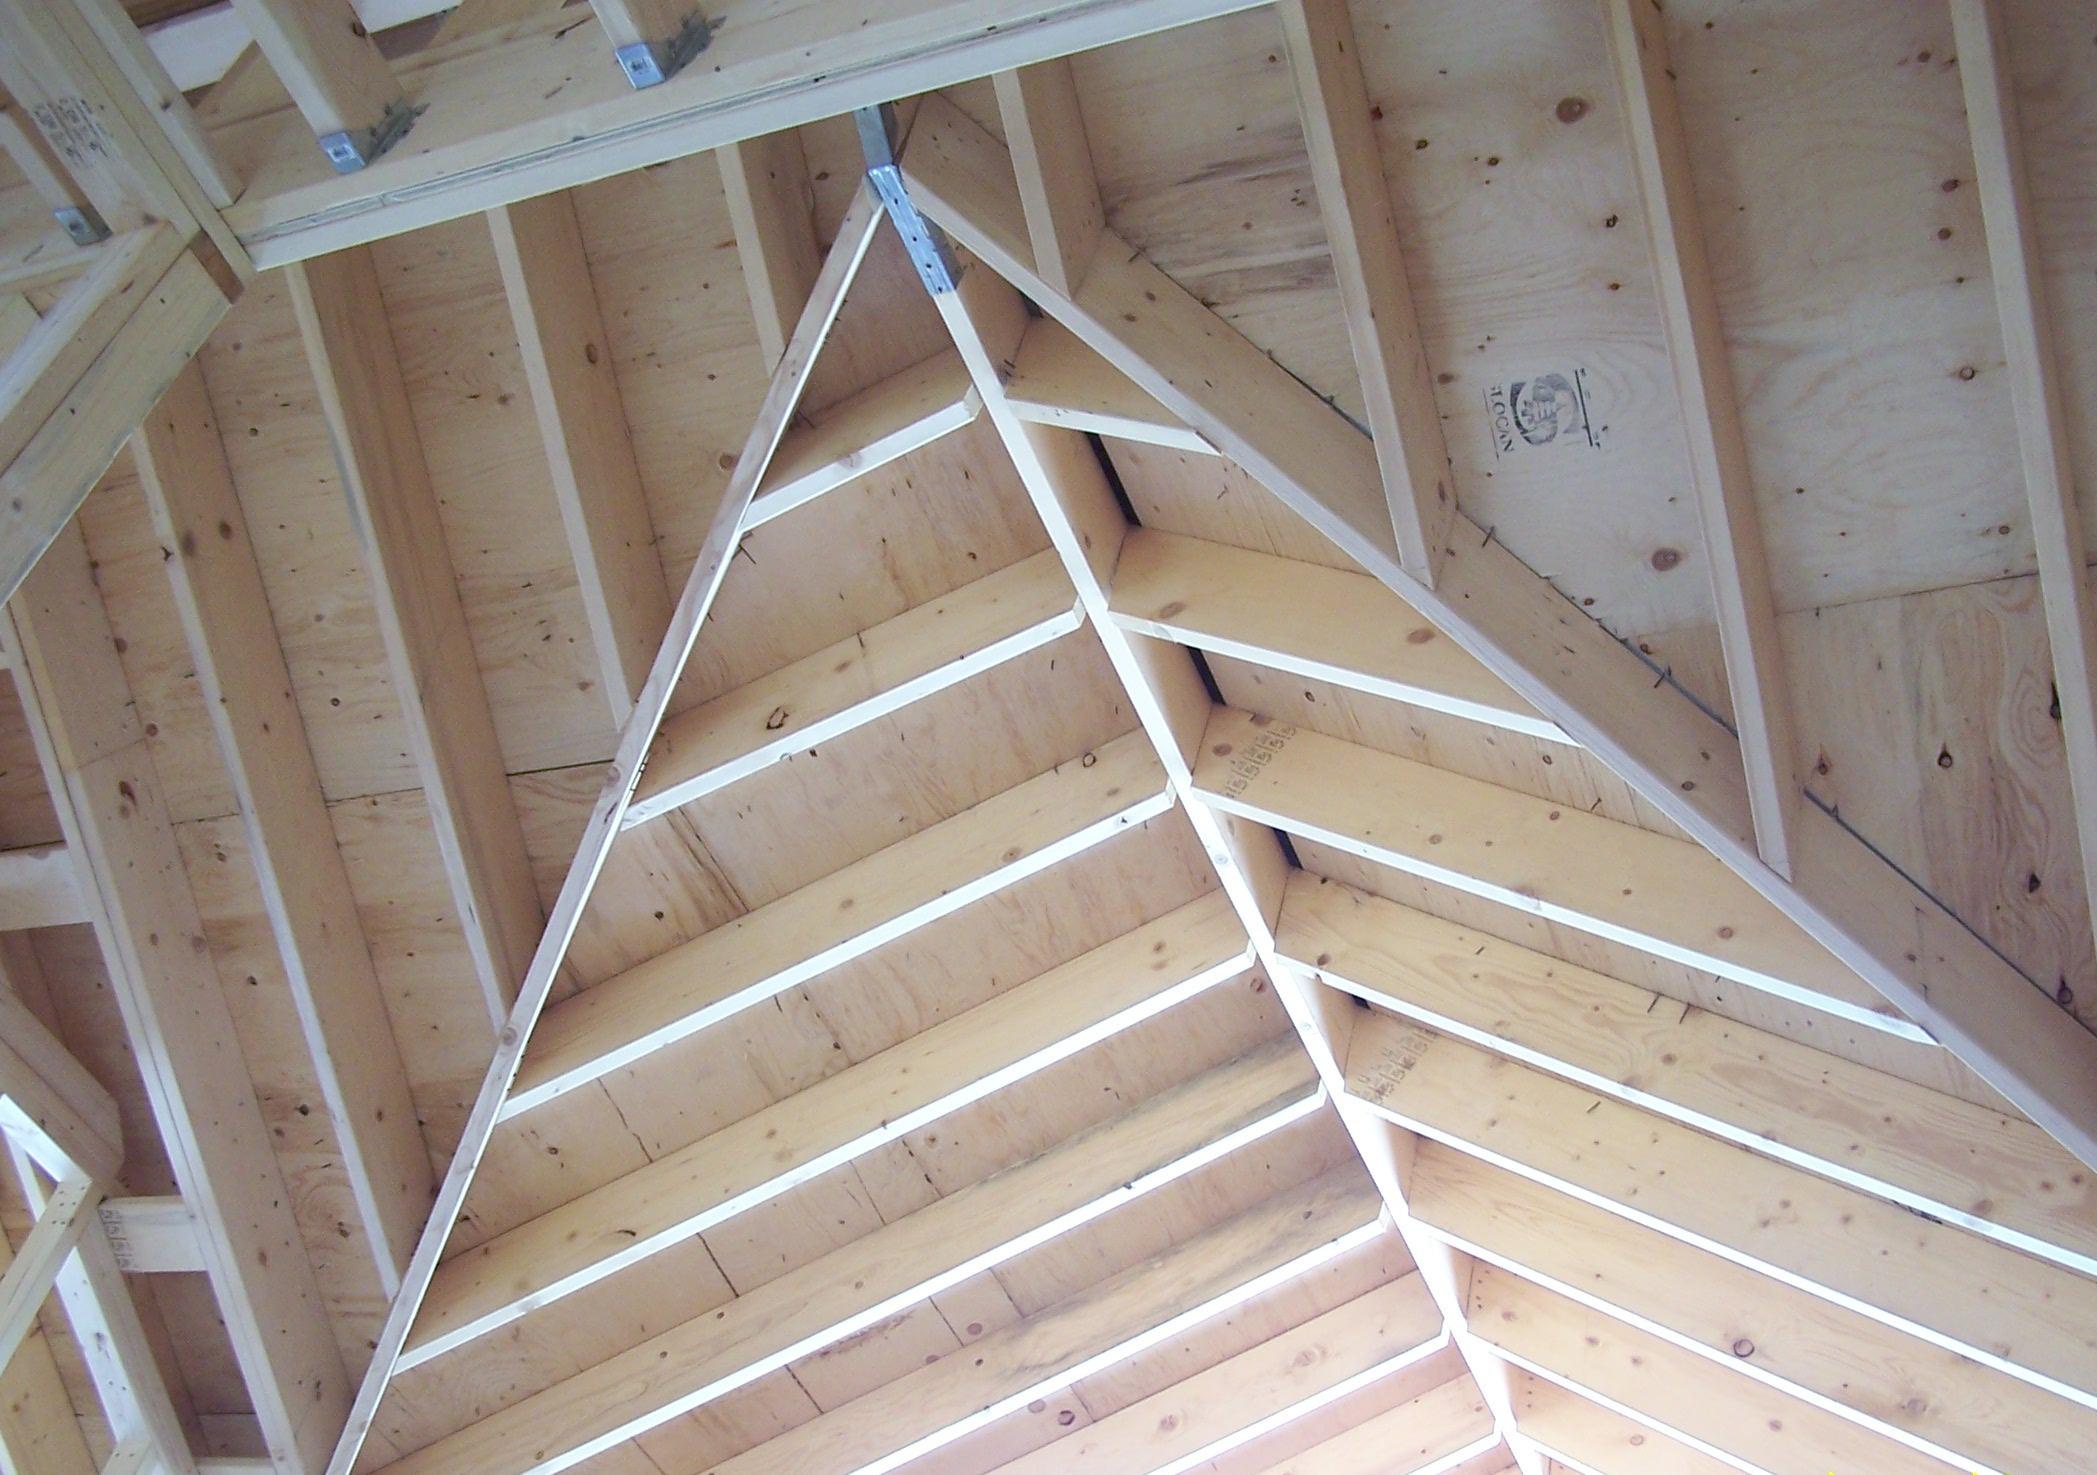 Estructuras madera images - Casas estructura de madera ...